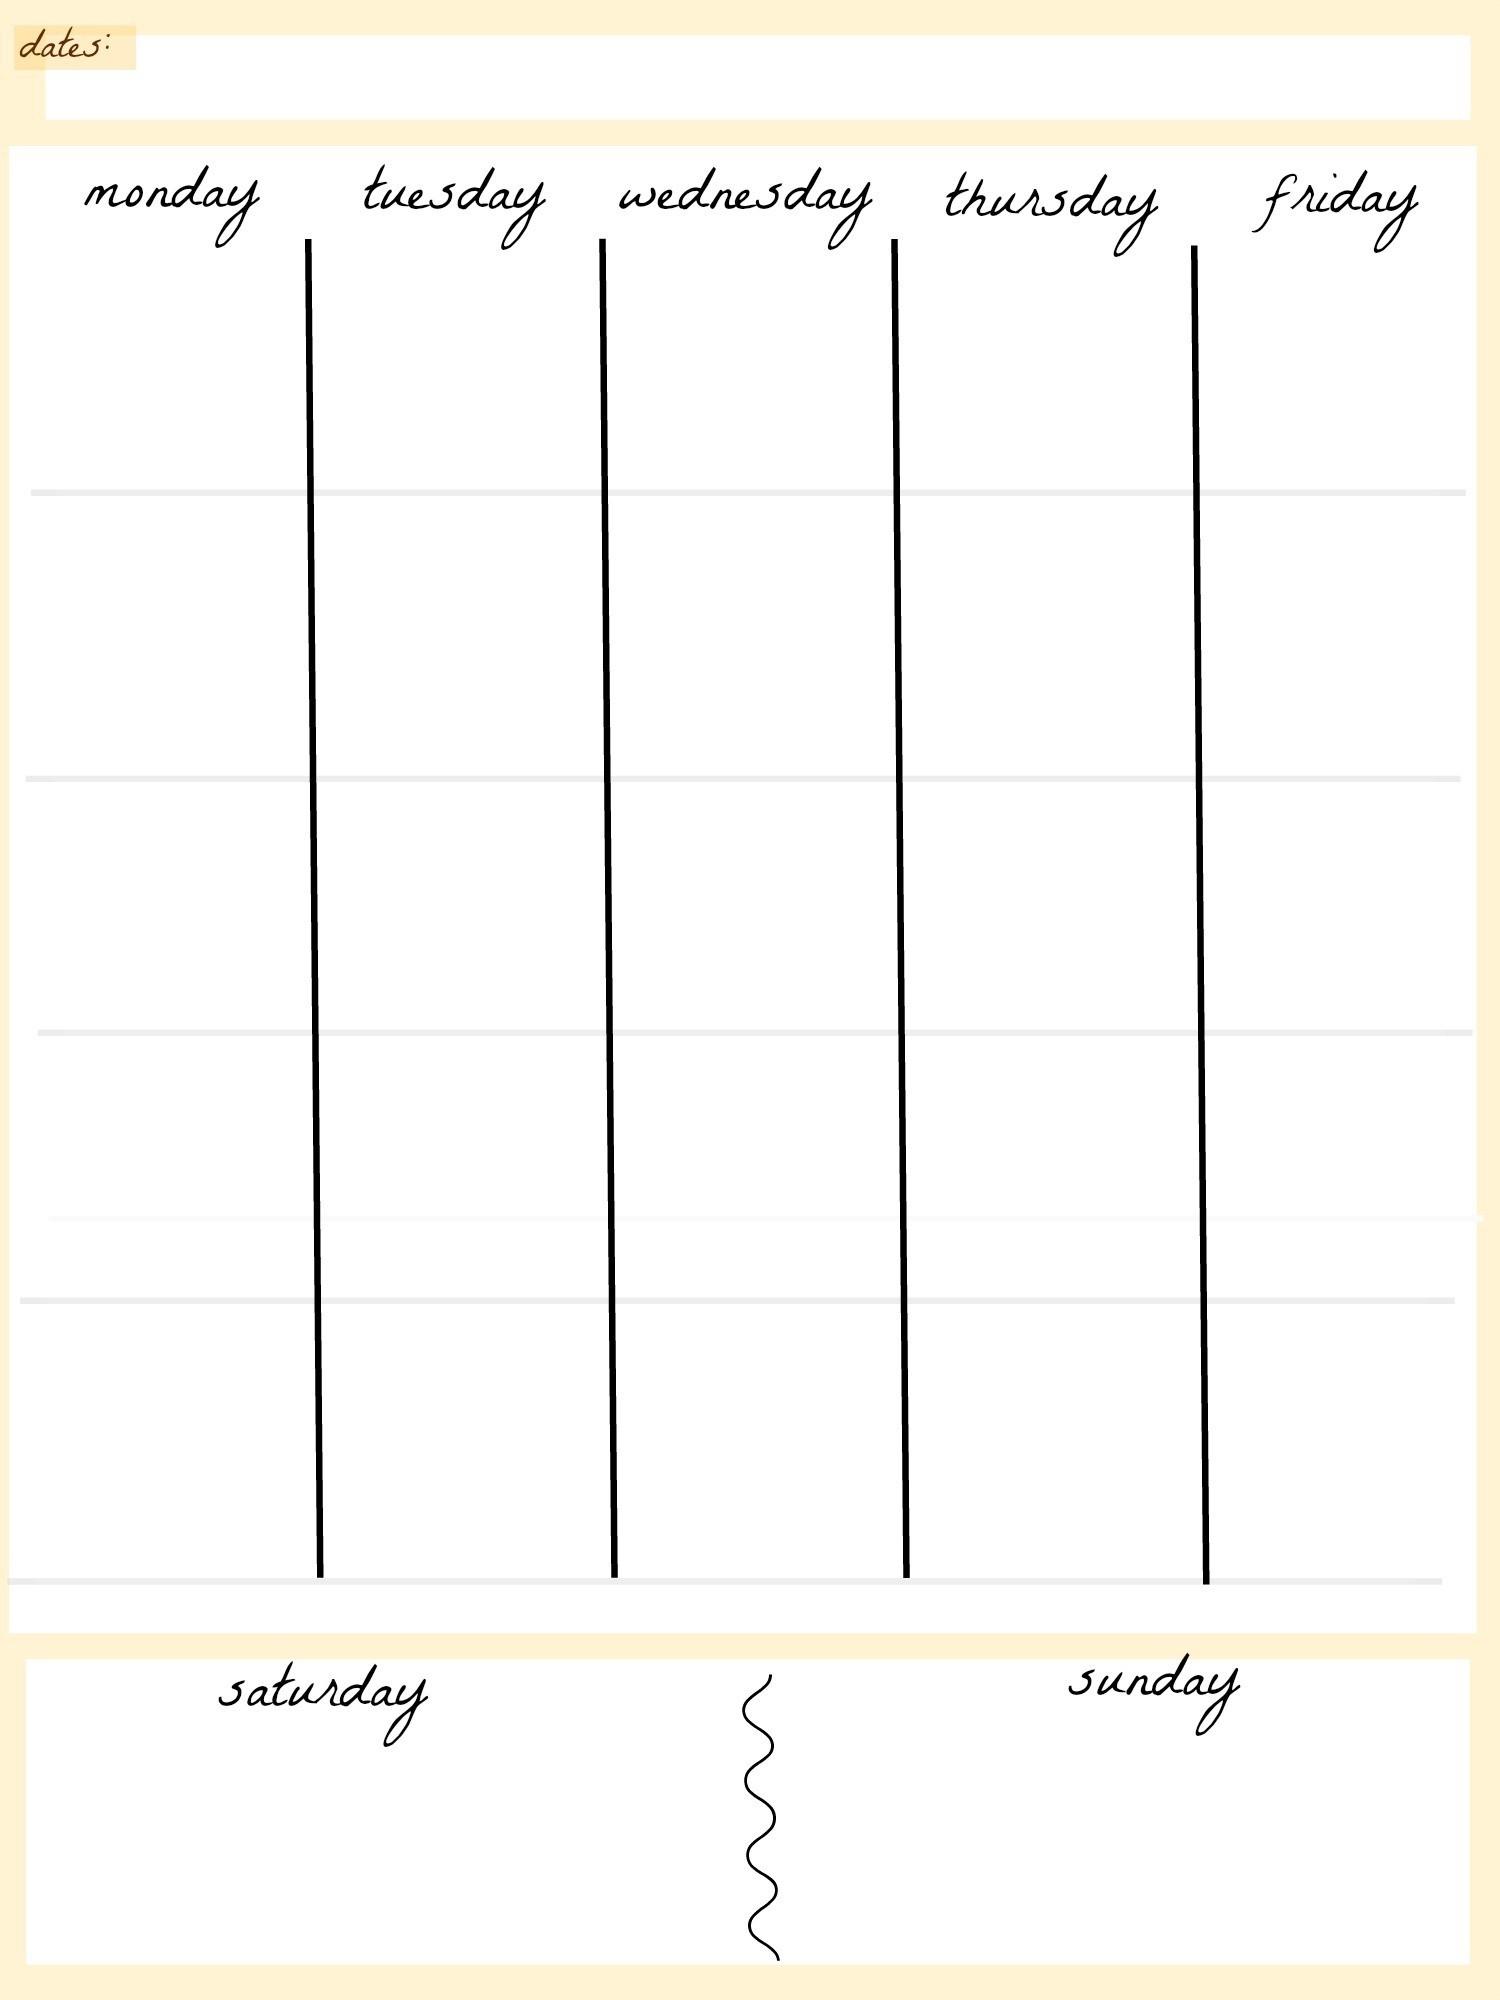 5 Day Week Calendar Templates | Calendar Template Printable